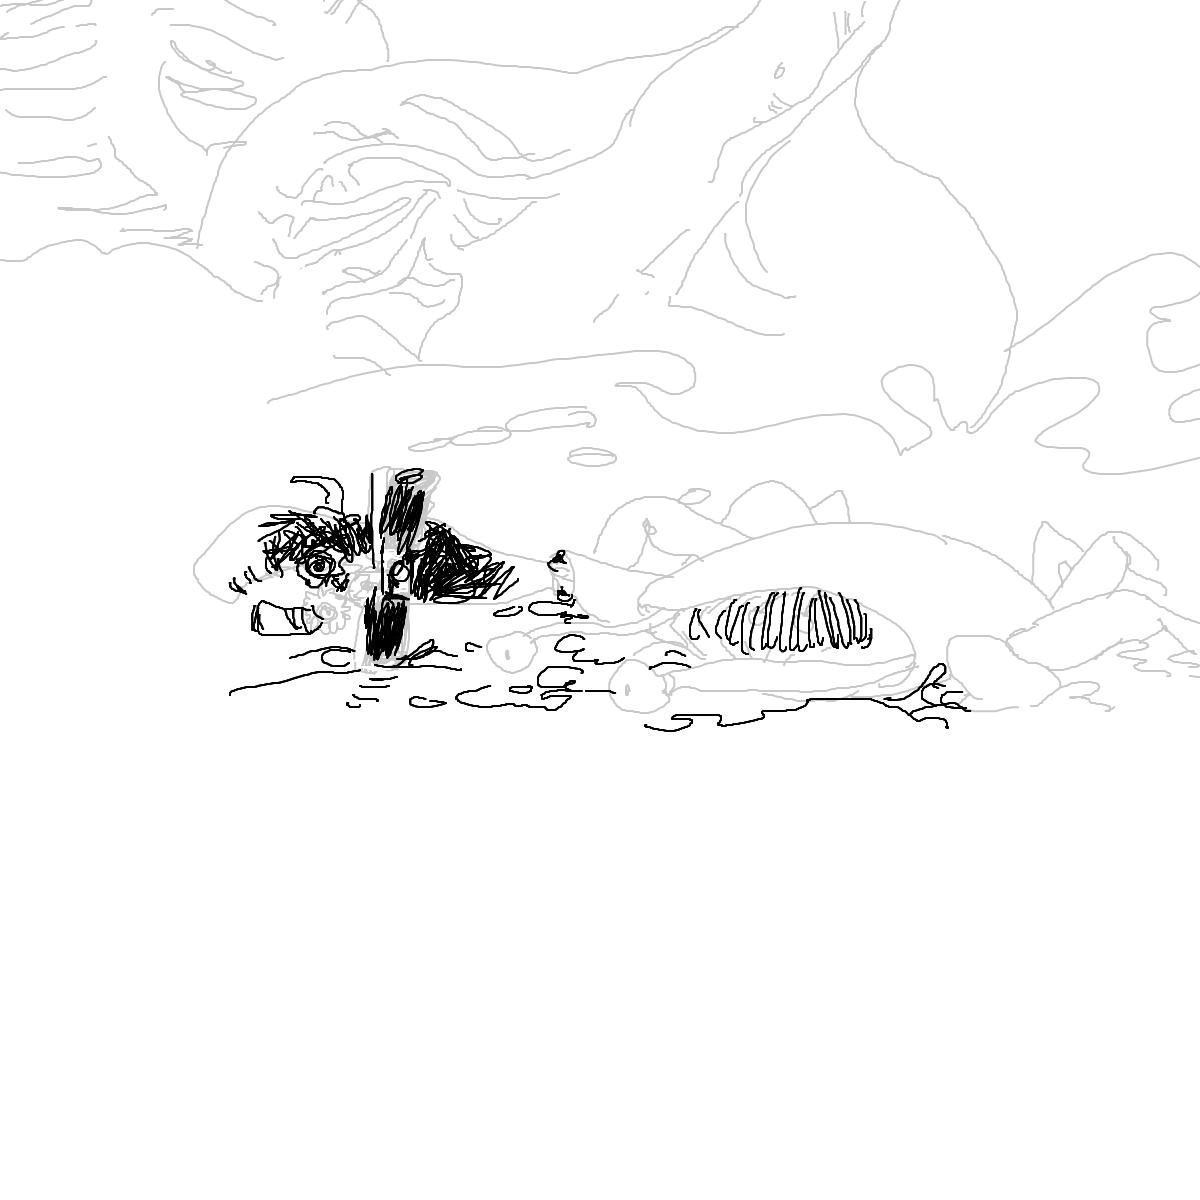 BAAAM drawing#22264 lat:78.4201278686523400lng: -4.4819955825805660